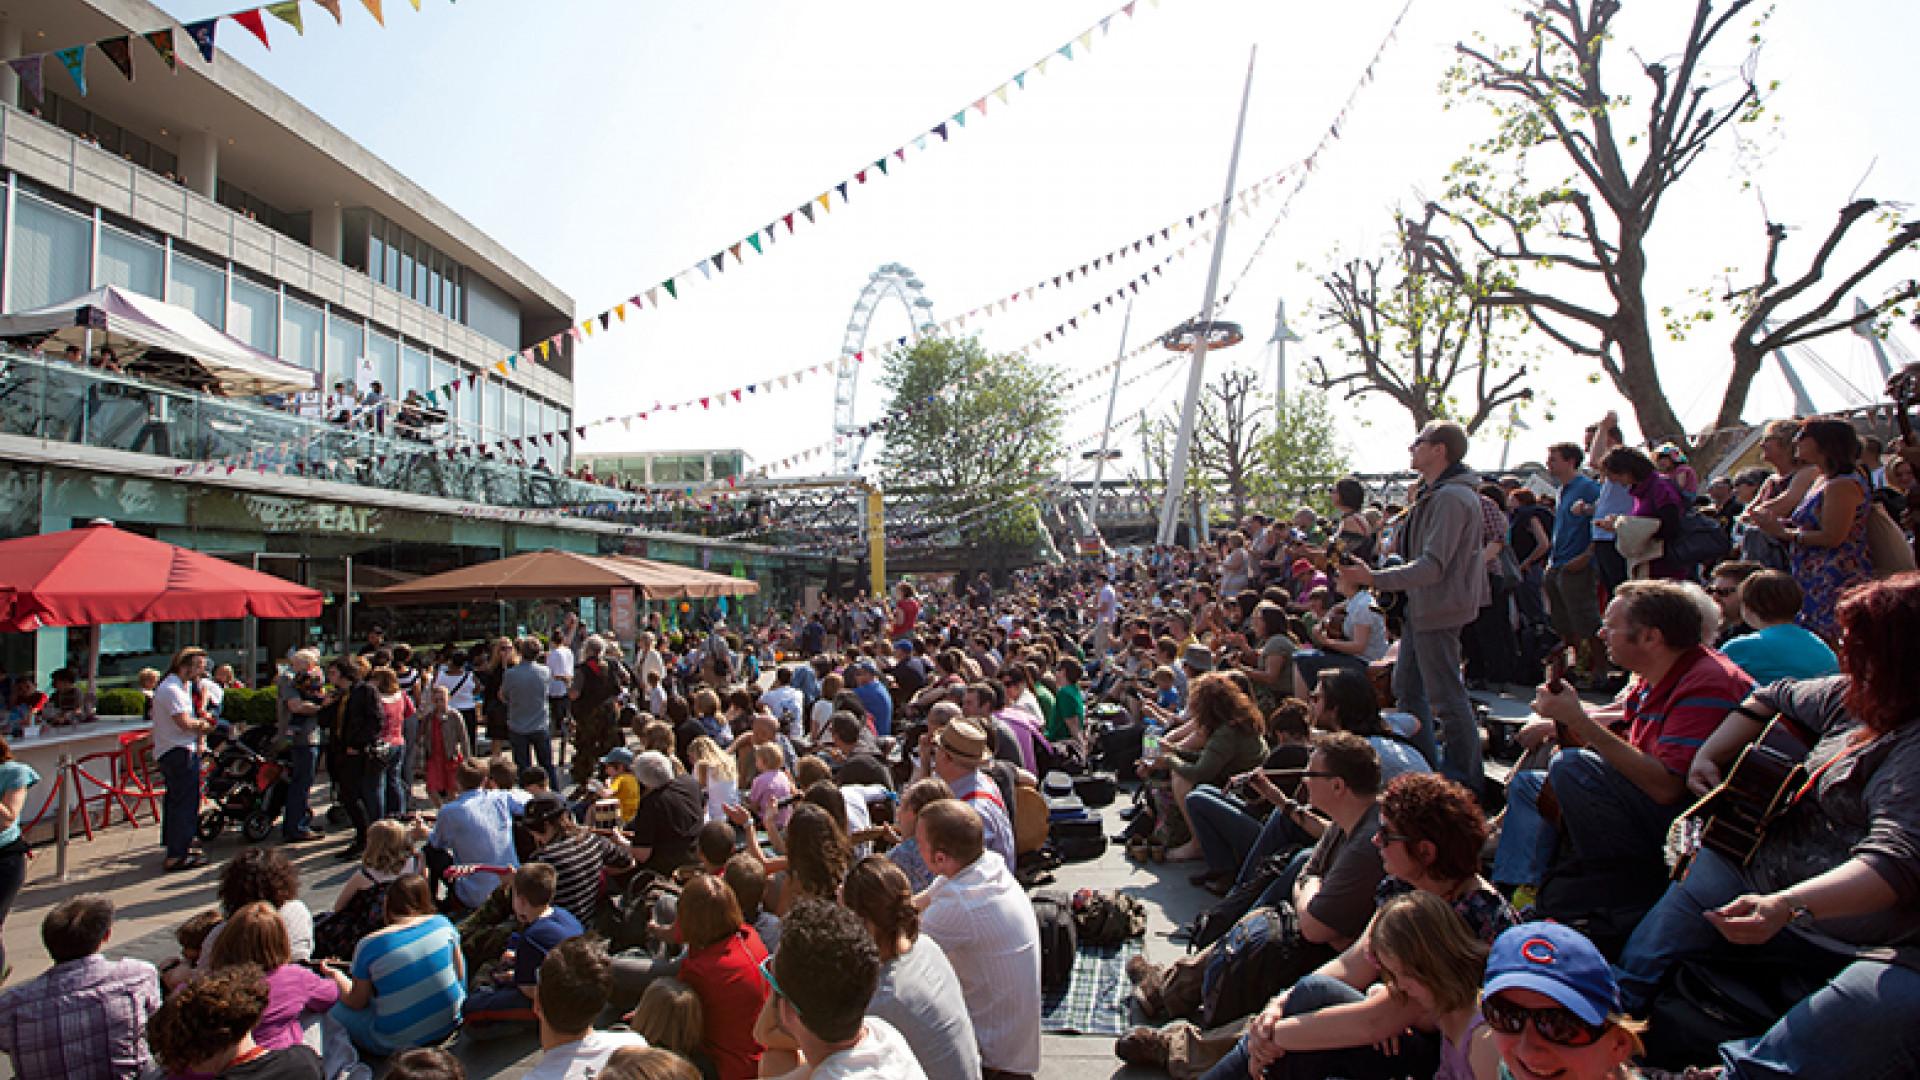 Crowd-at-Southbank-Centre_Credit-Belinda-Lawley